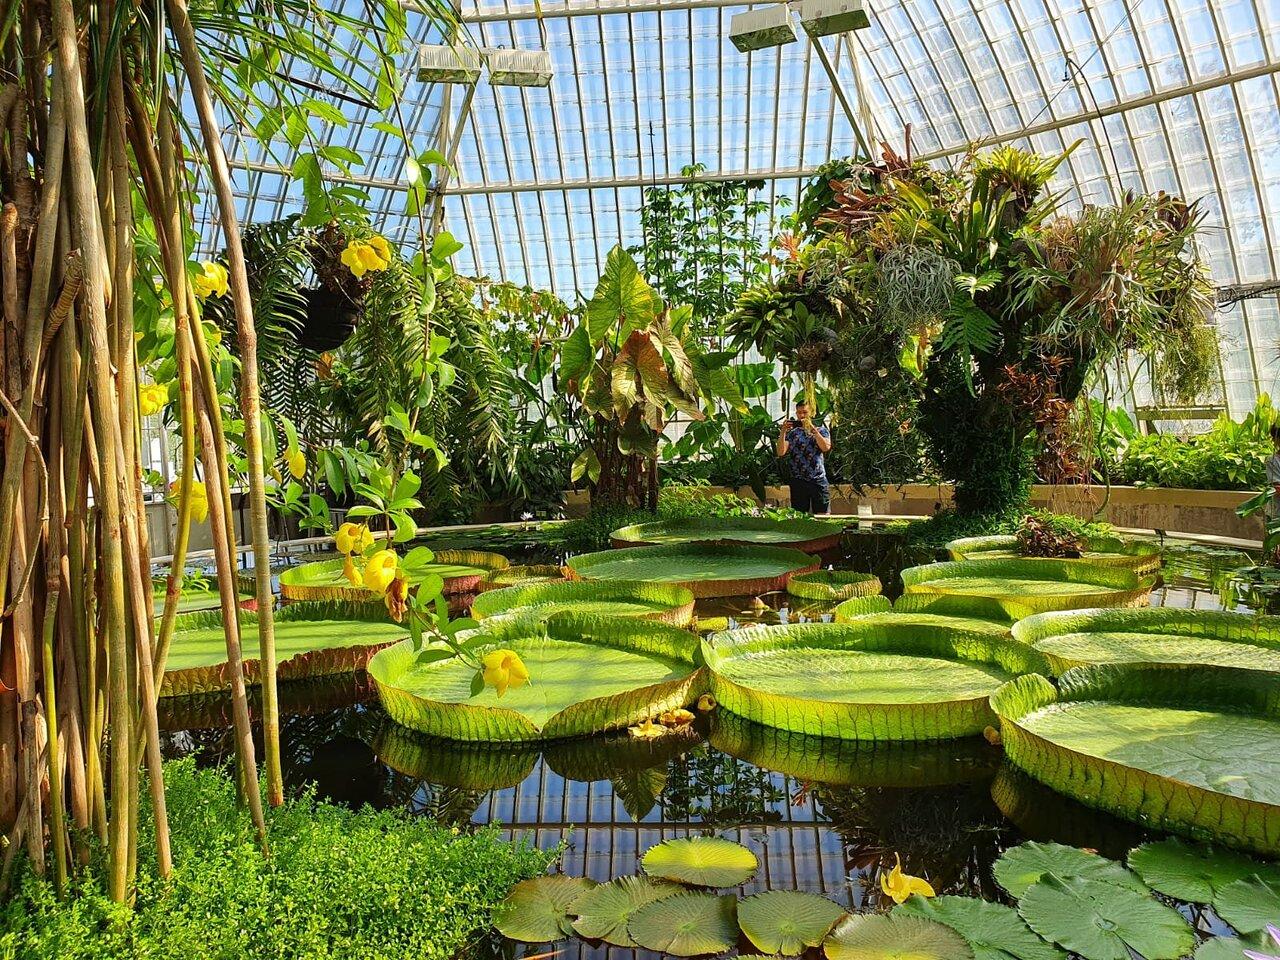 lily garden spa stockholm